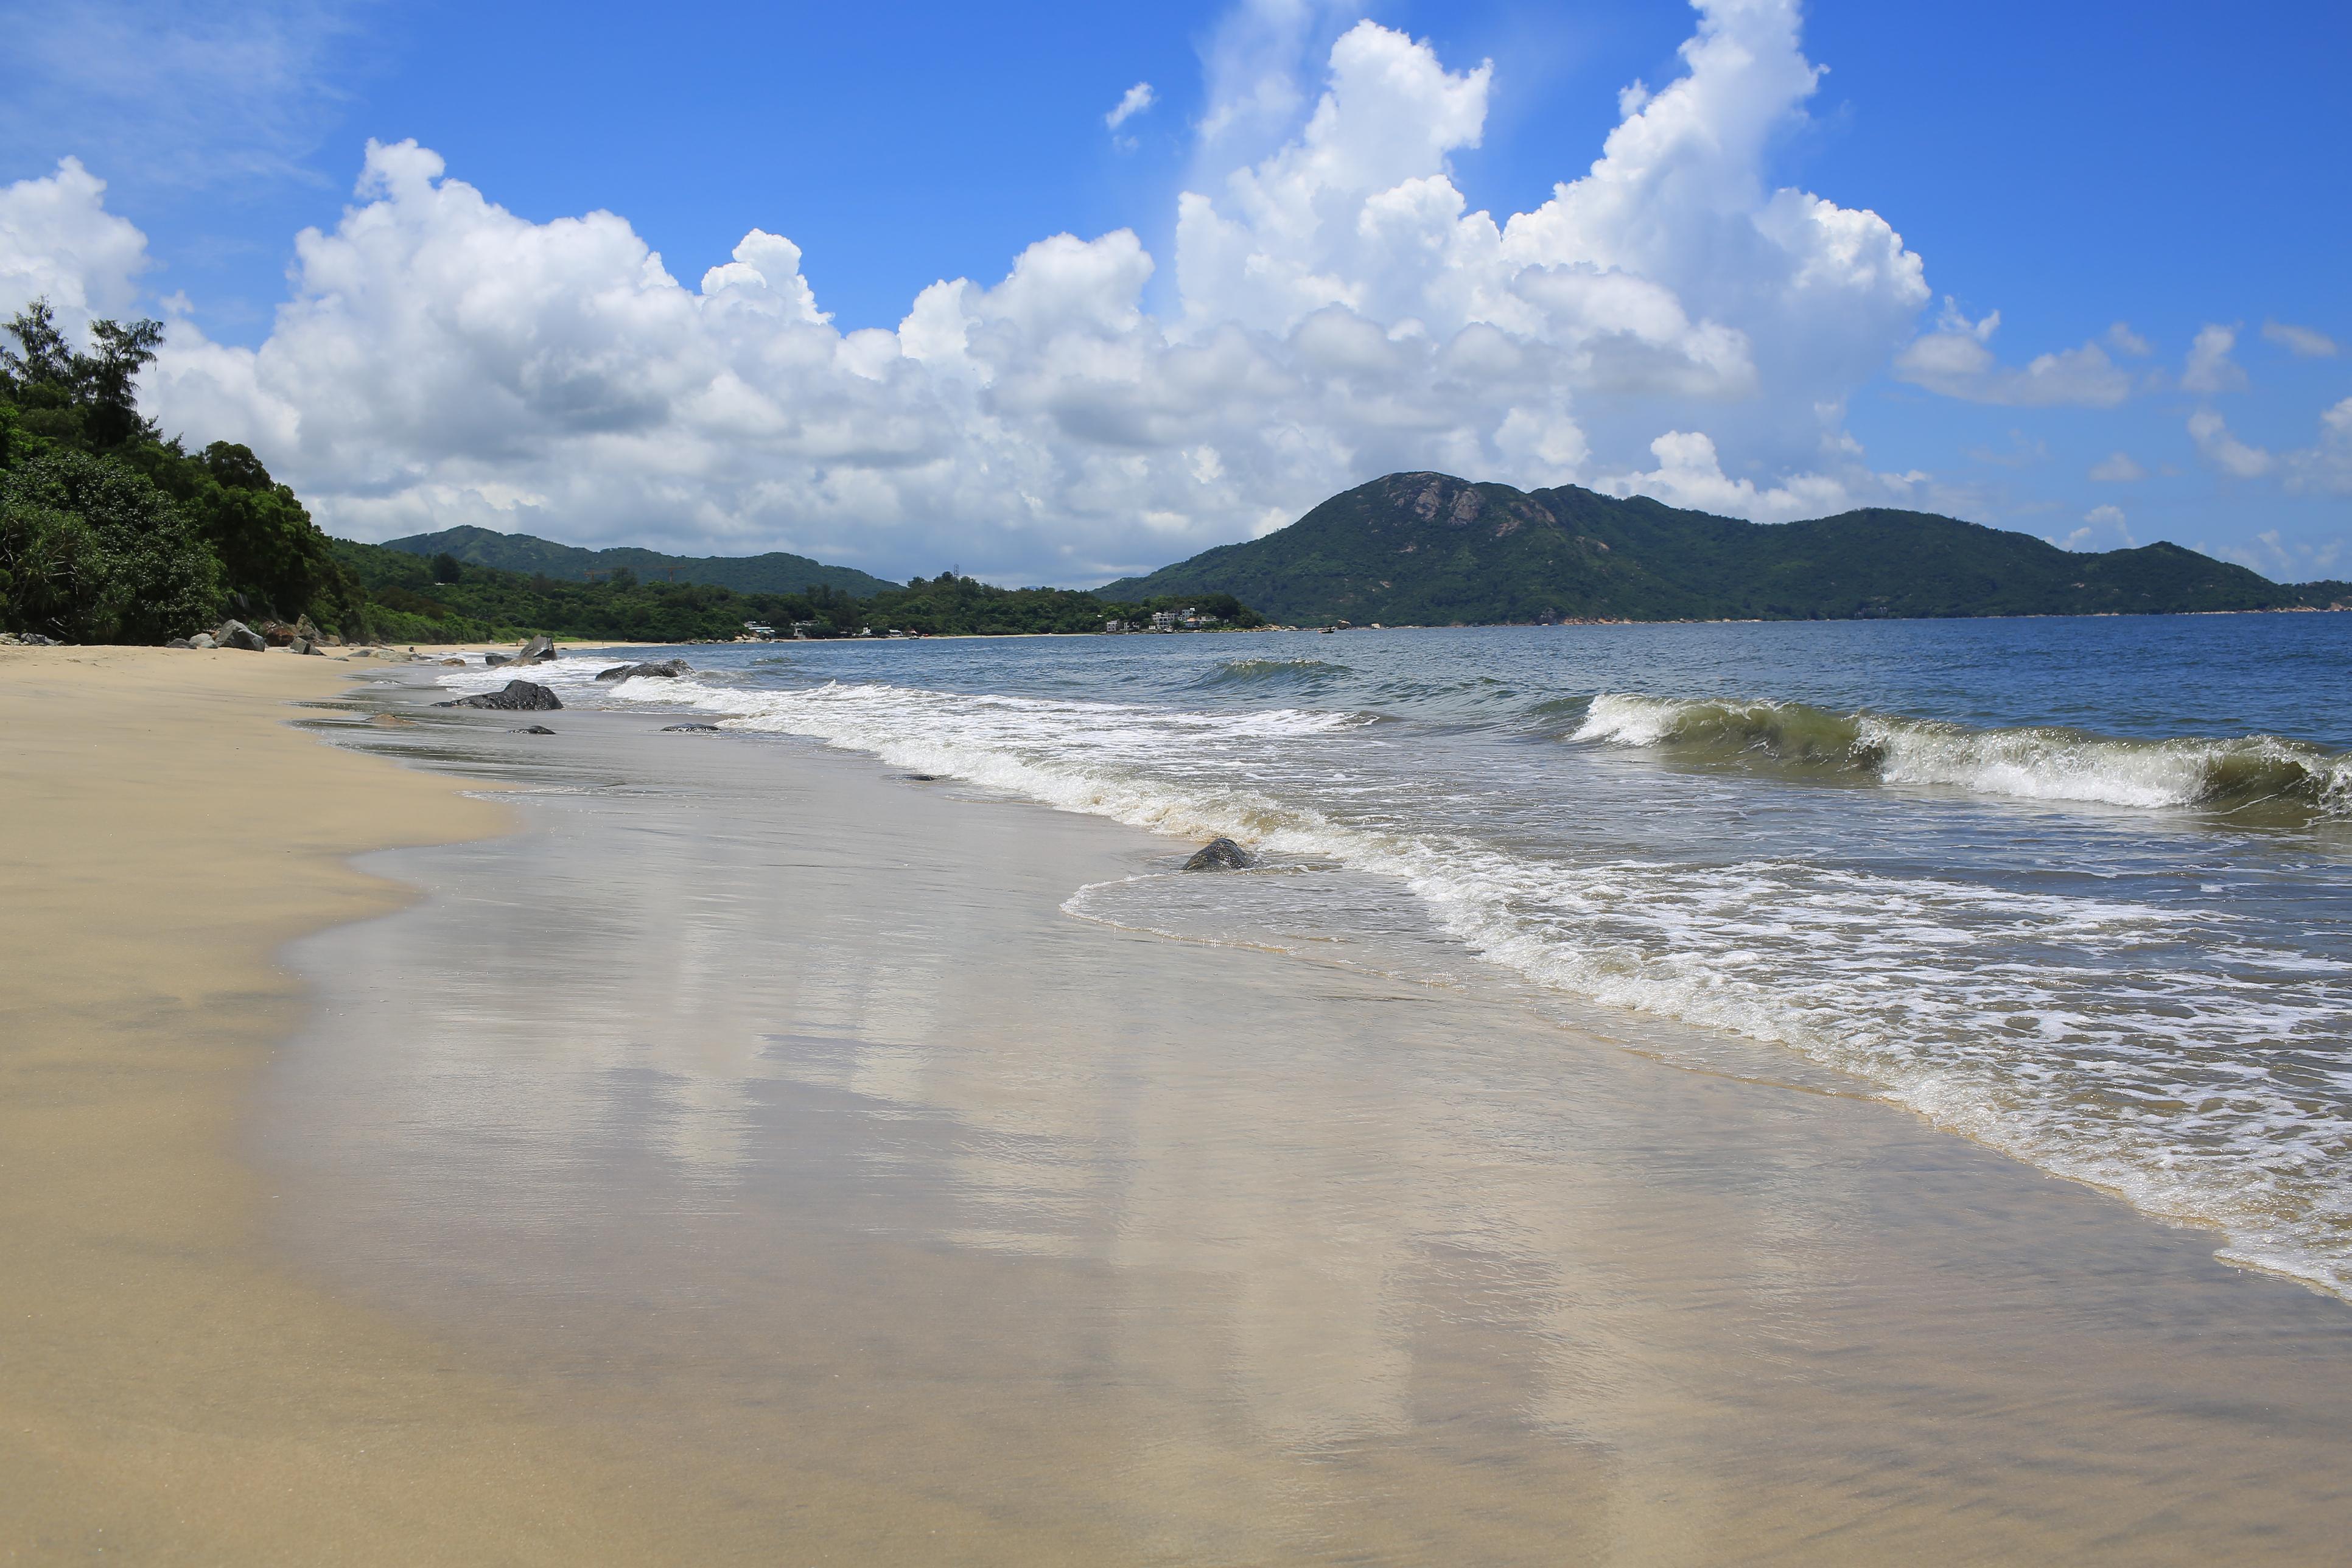 Waves breaking on Cheung Sha Beach on Lantau island